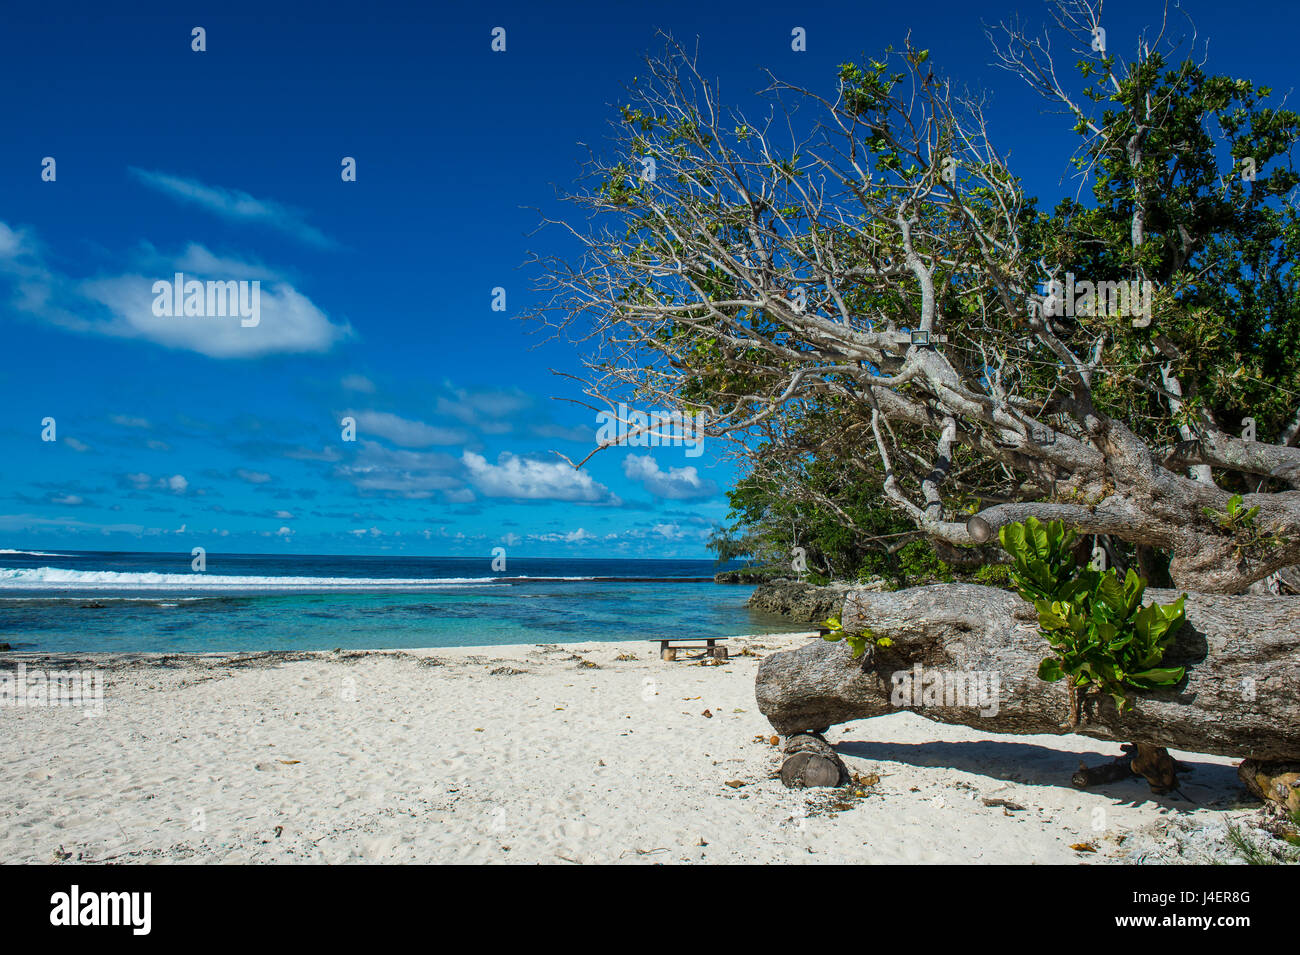 White sand beach on the north coast of Efate, Vanuatu, Pacific - Stock Image